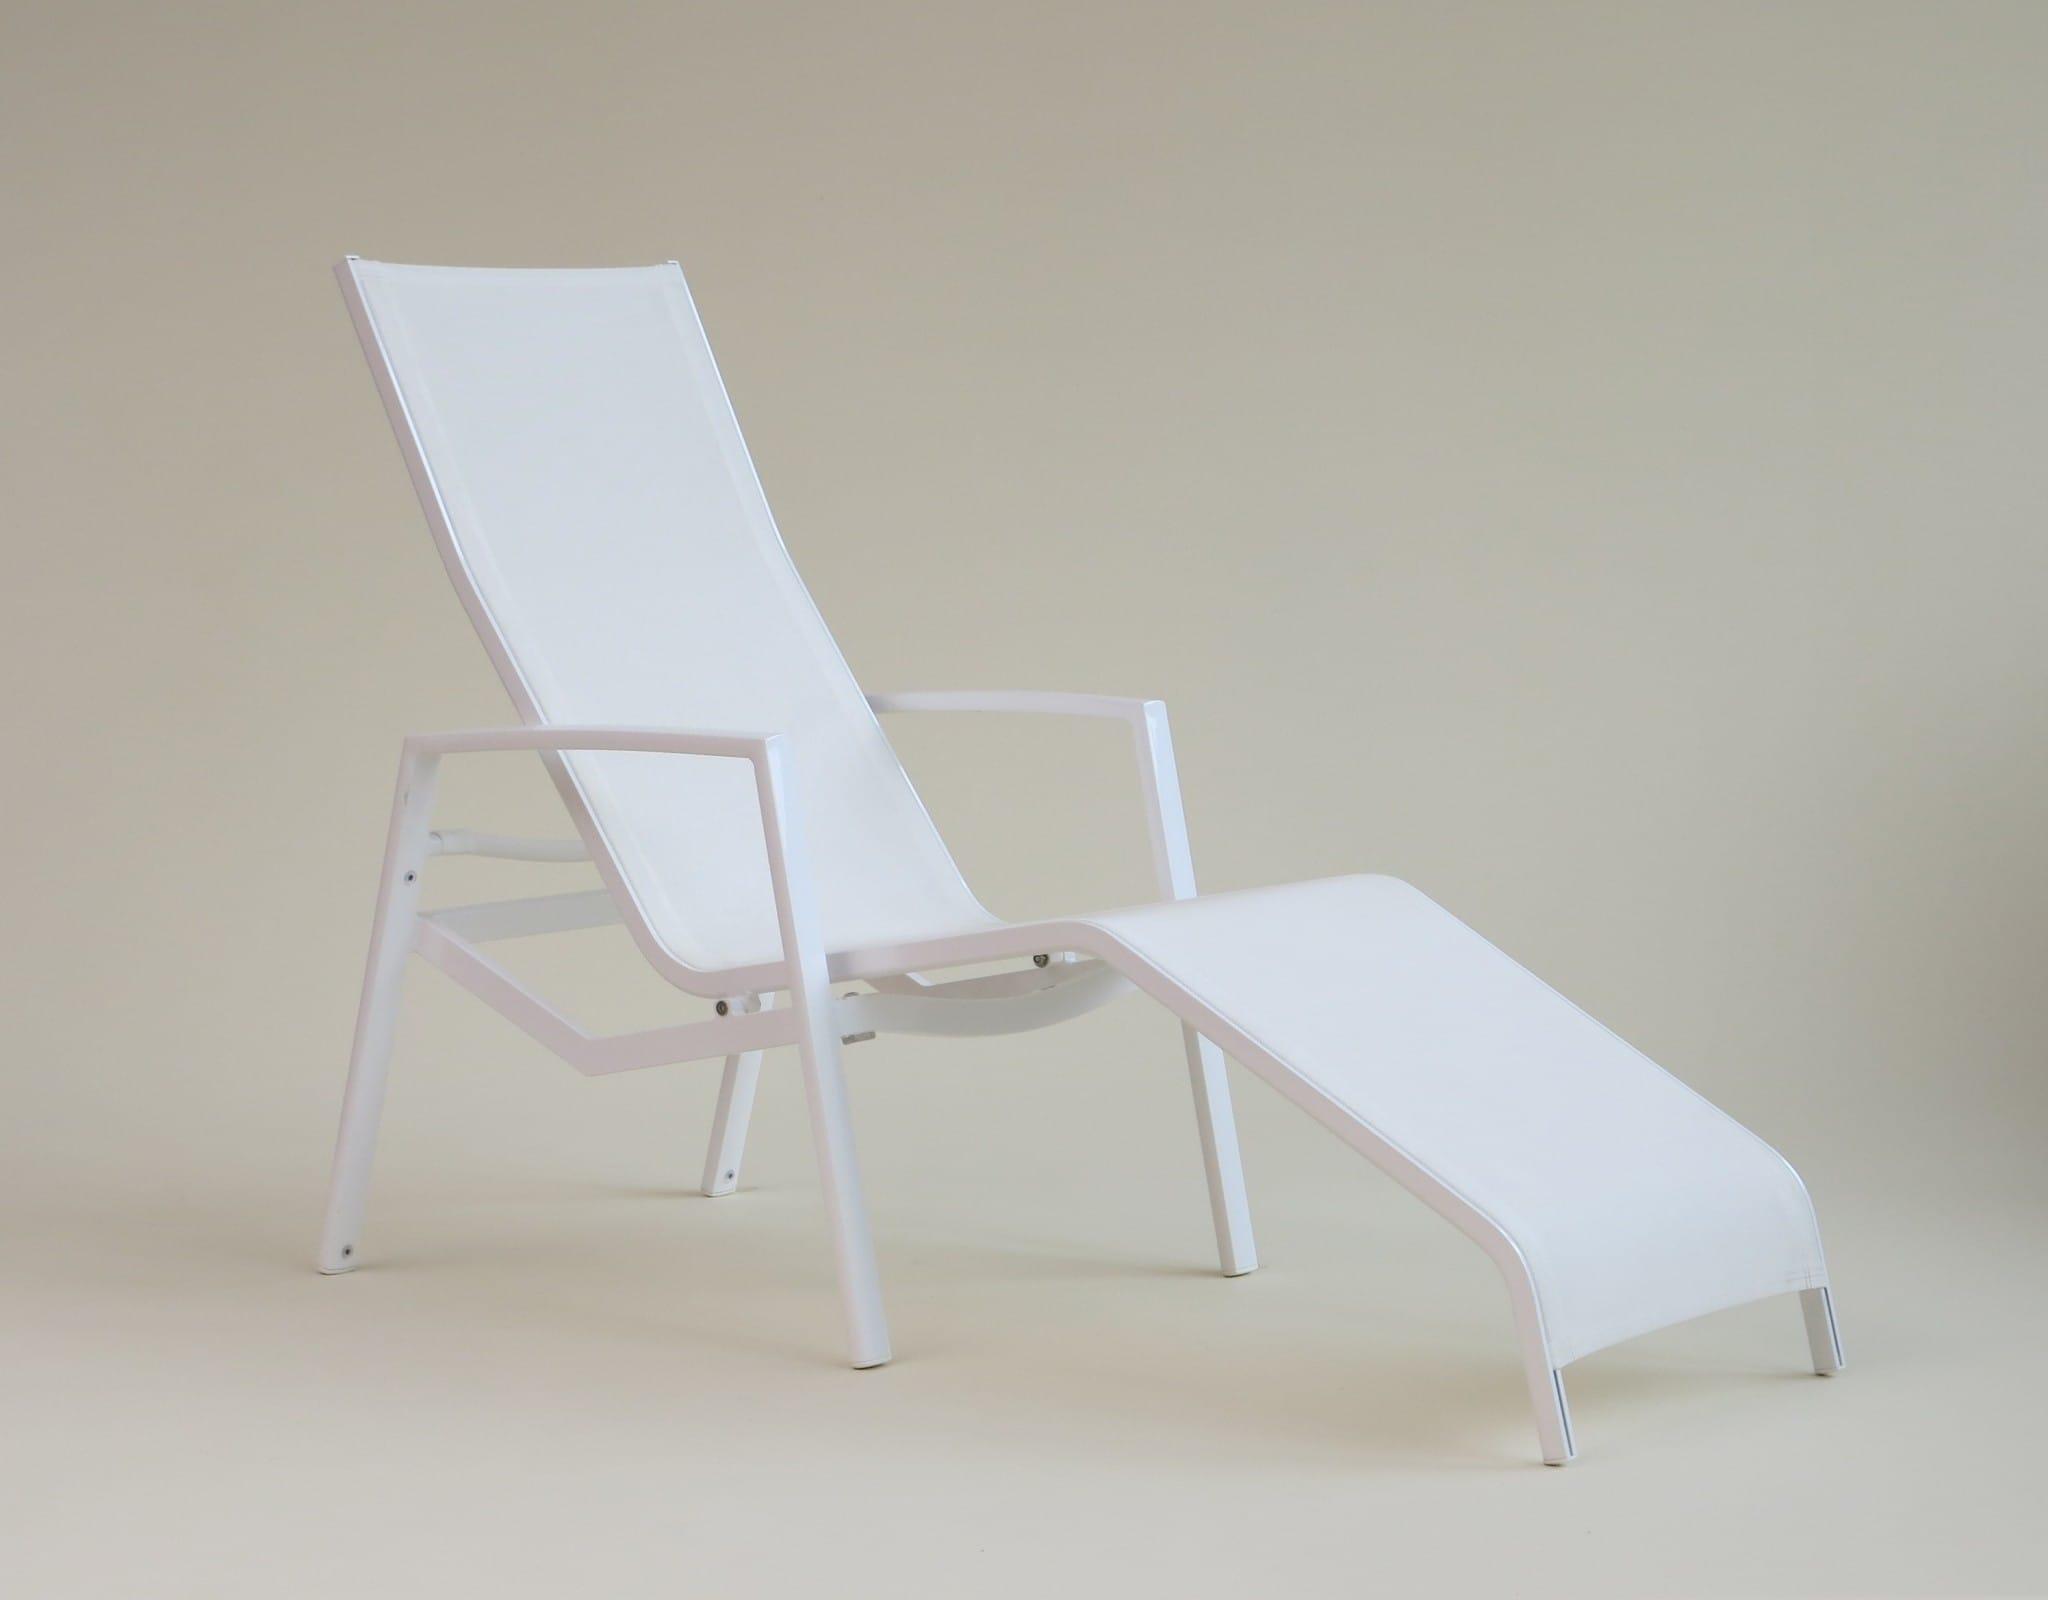 carma Aluminium Kippliege Luzern weiß – Batyline®   Bumb ...